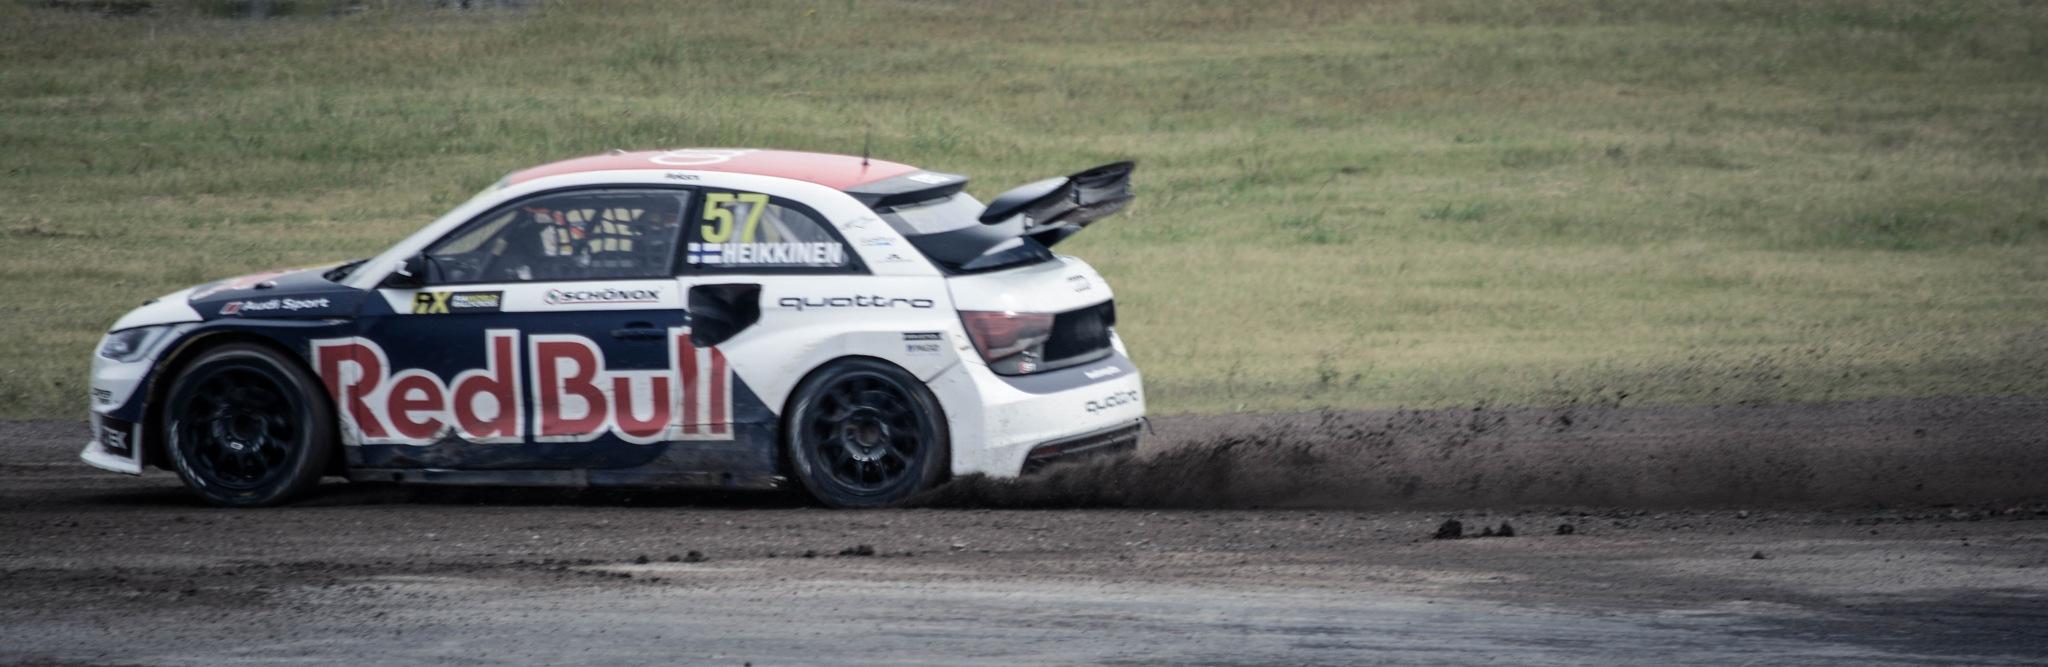 Rallycross  by rodluce